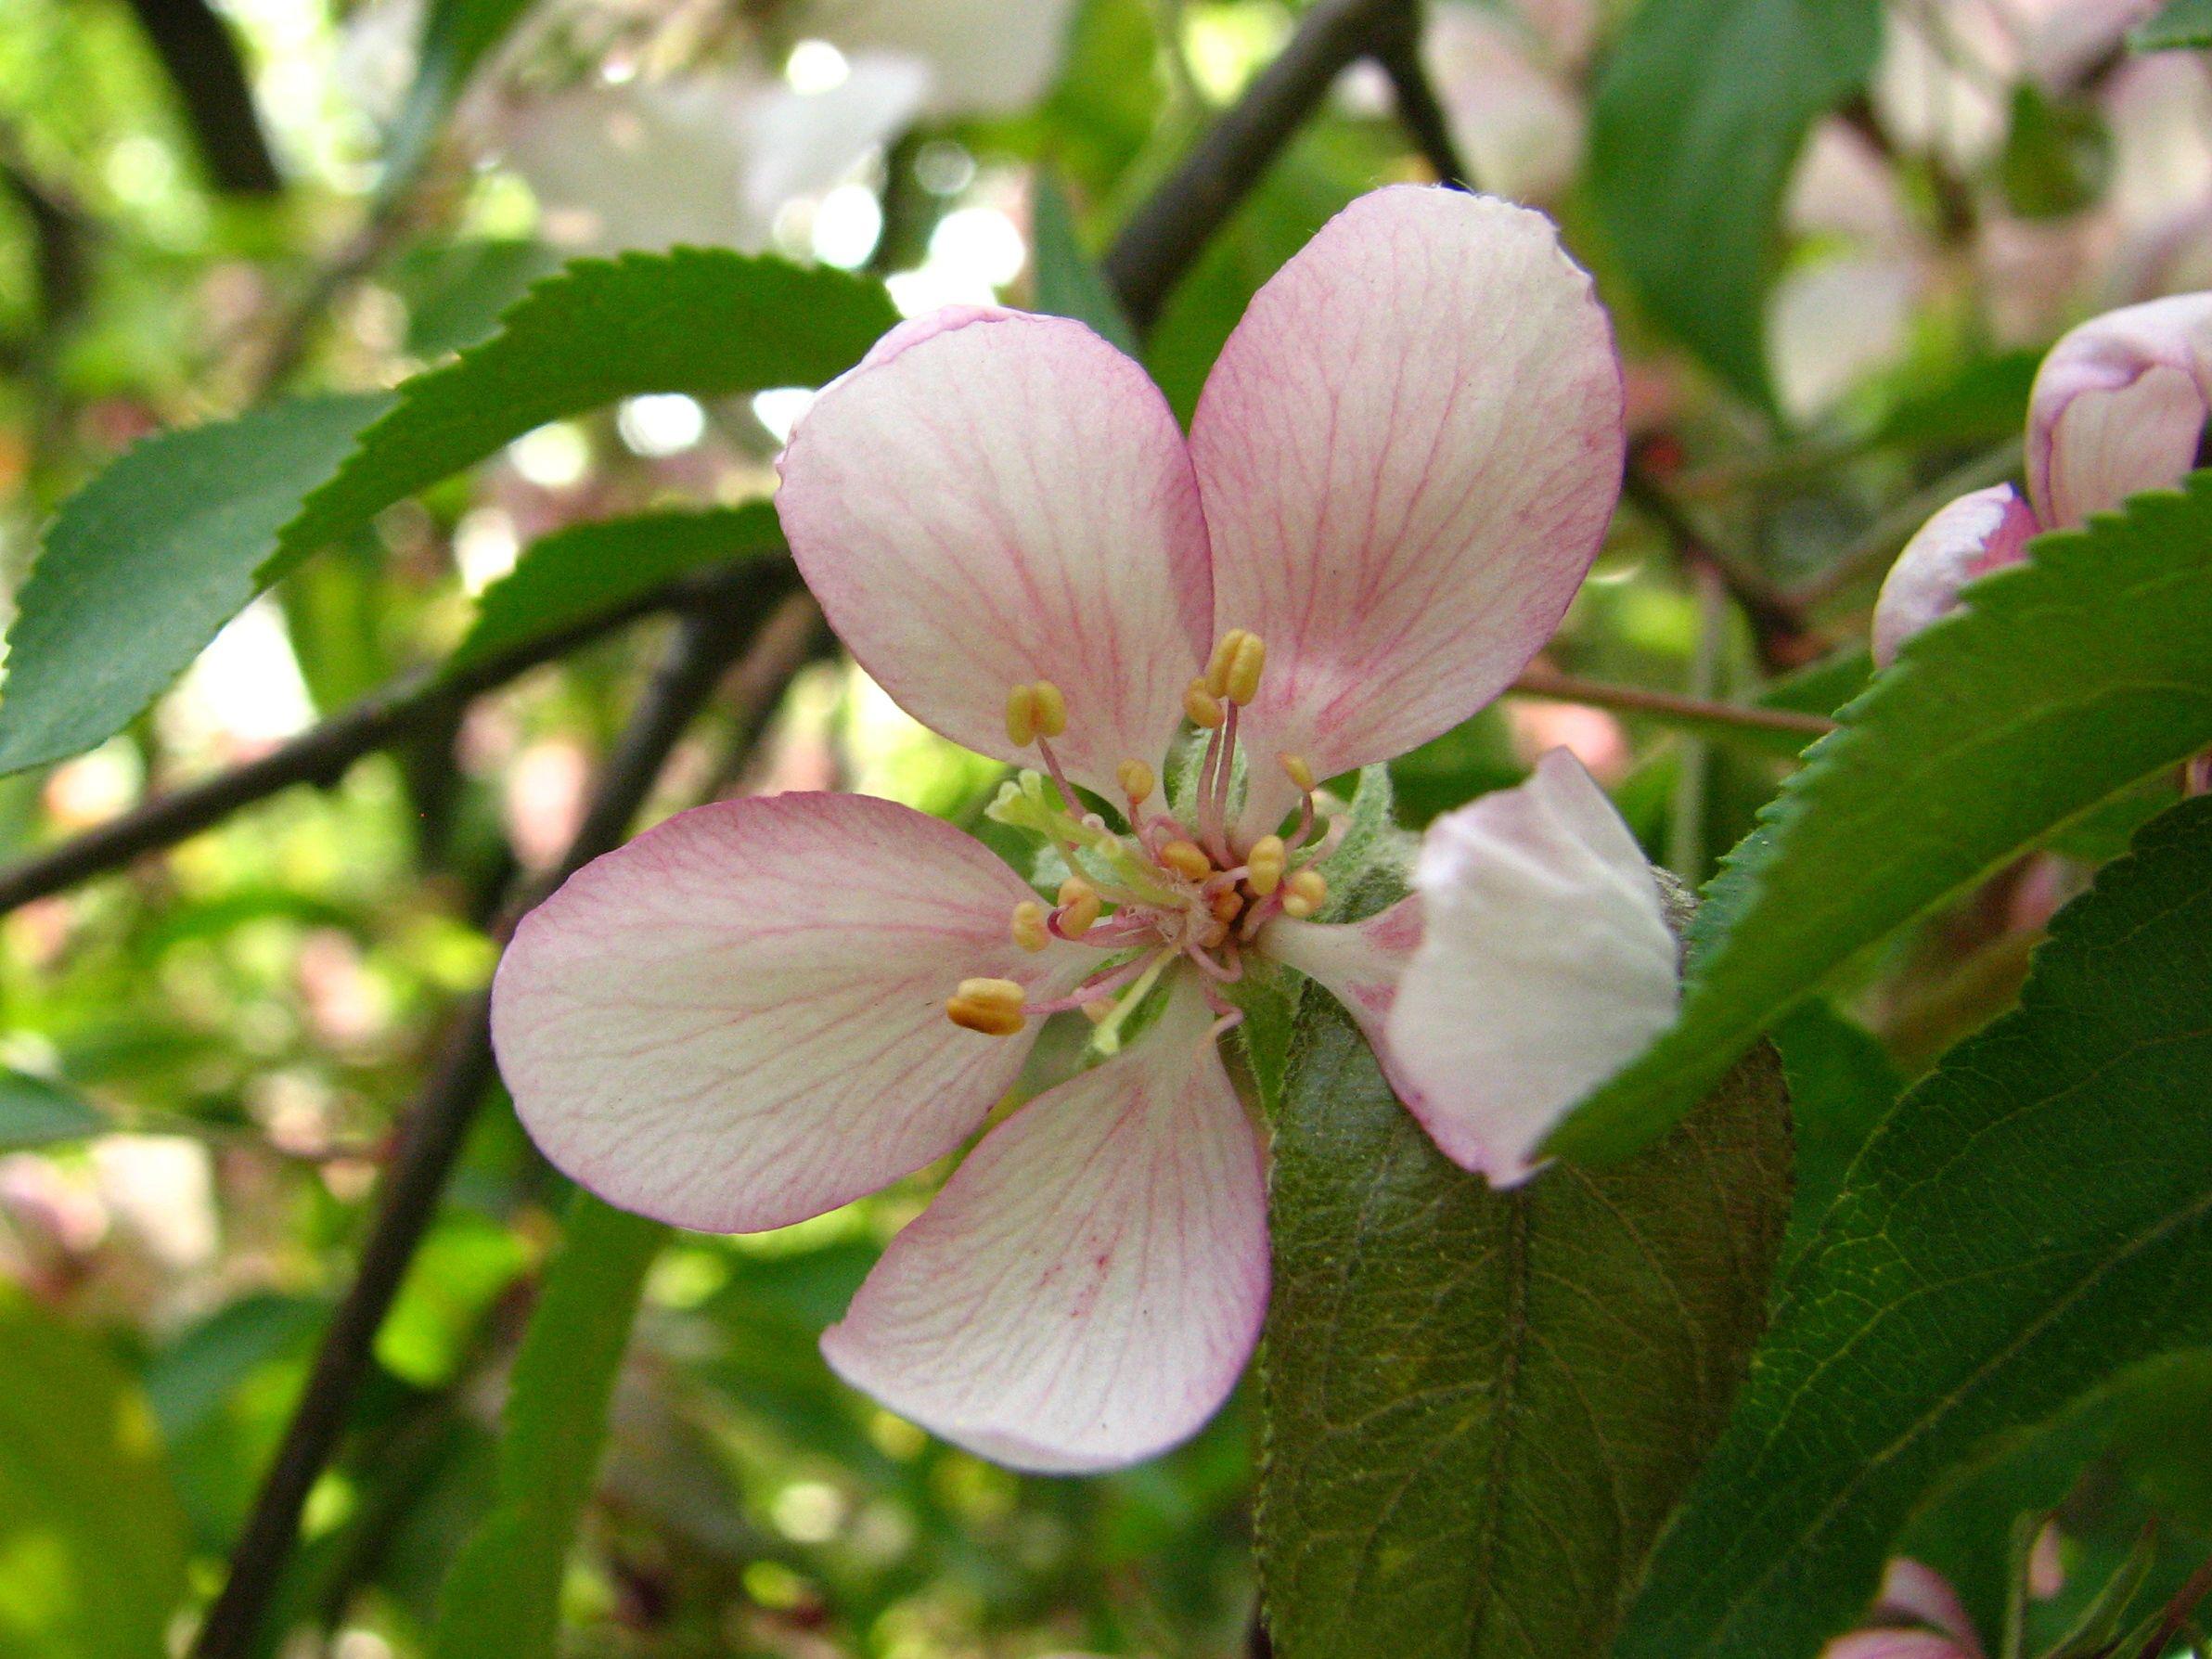 Close-up-flower-of-Apple